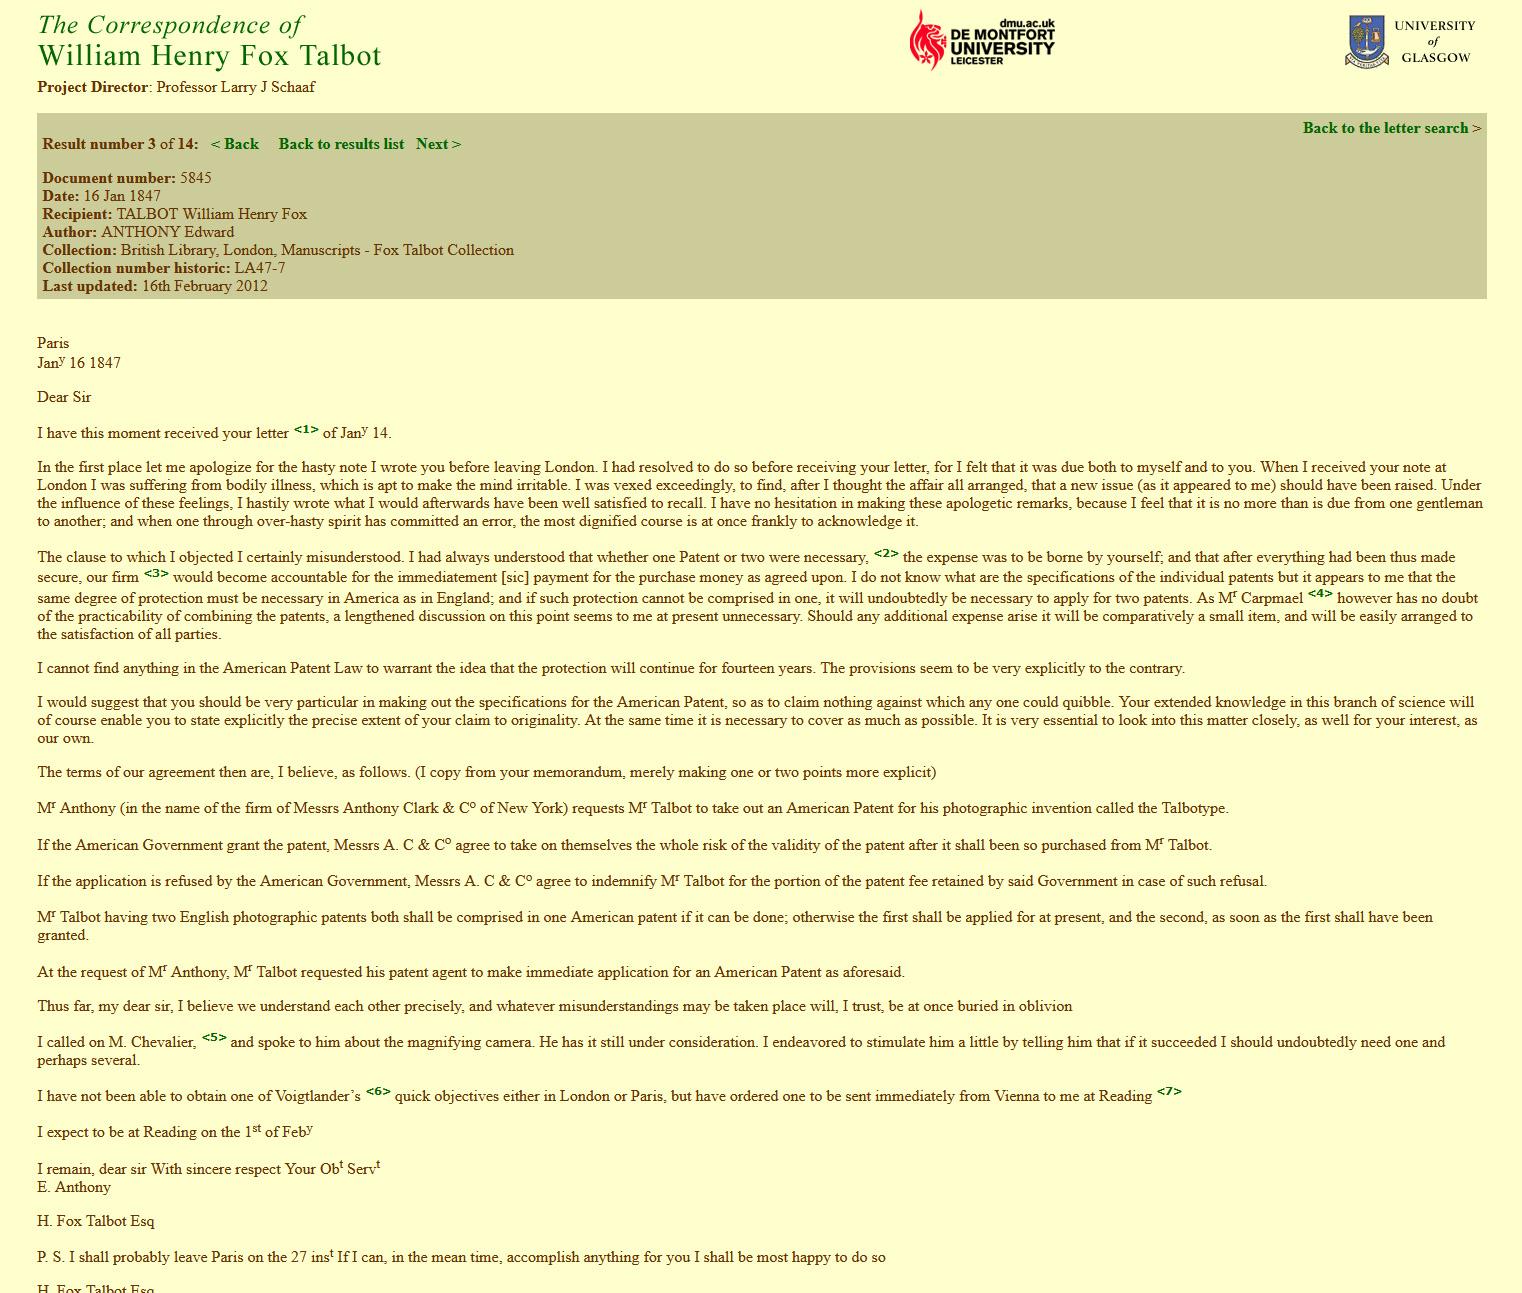 Correspondence from Talbot to Edward Anthony